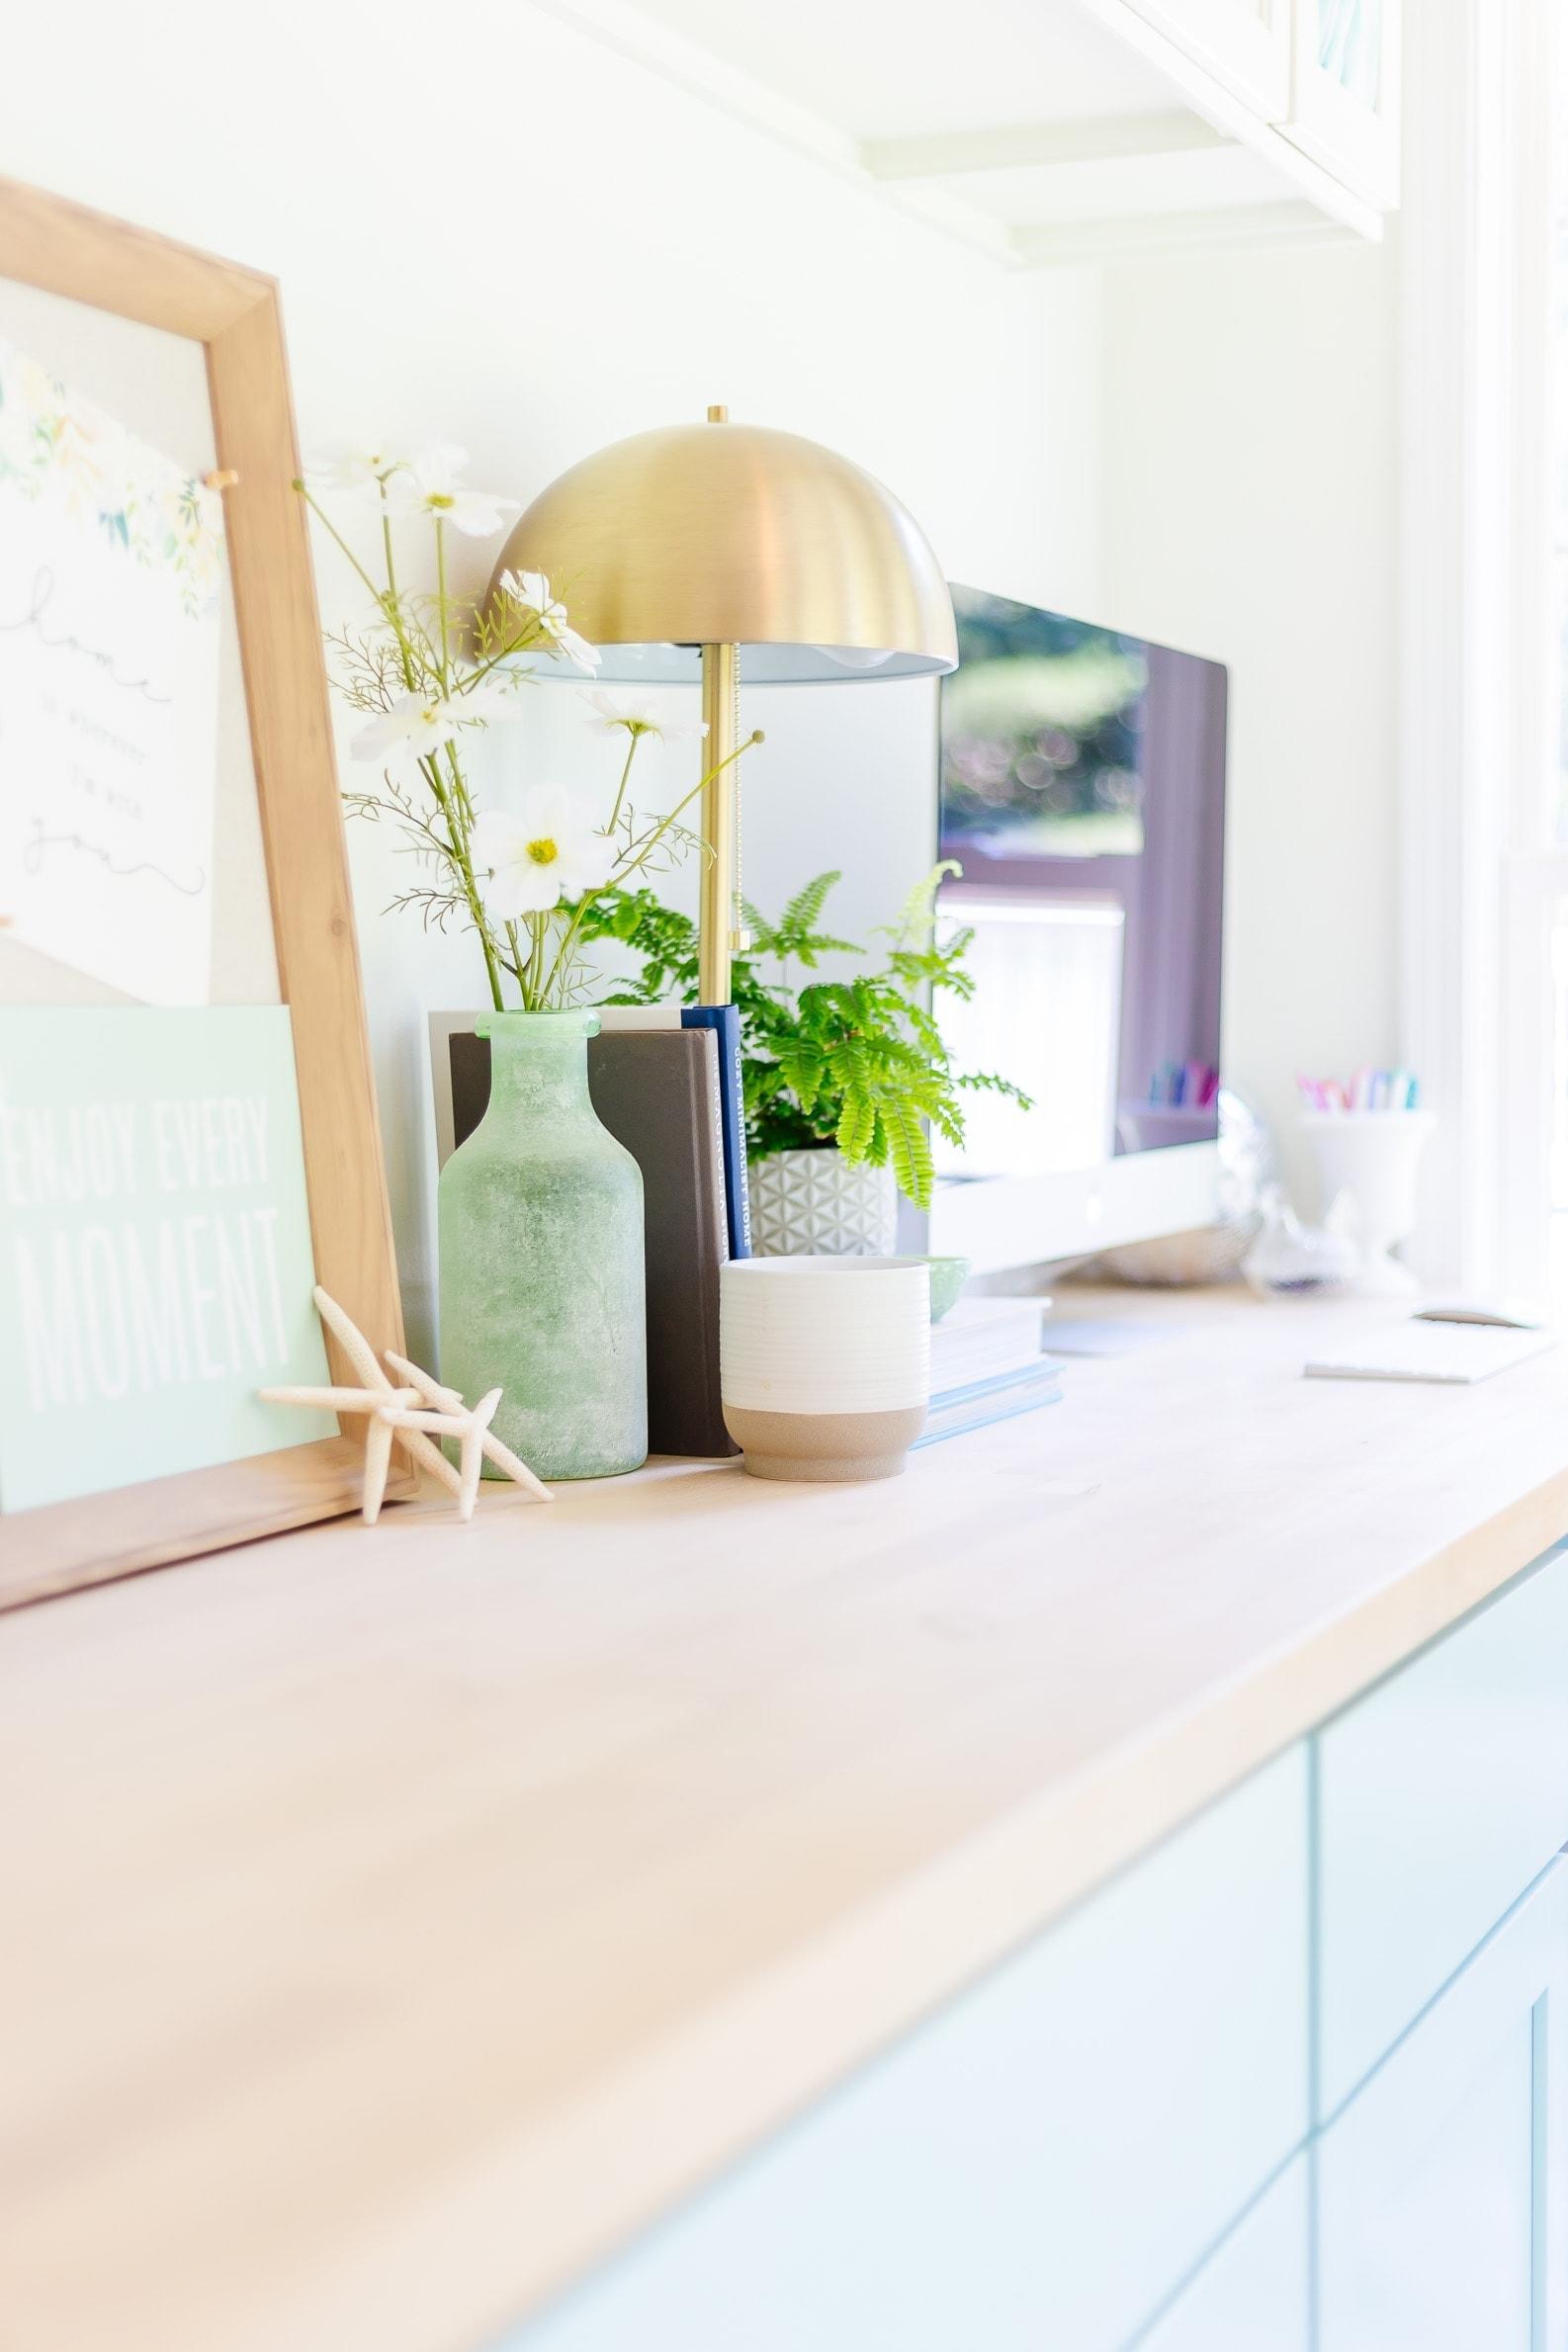 matte brass lamp with diy butcher block desk, coastal style decorating, home office ideas